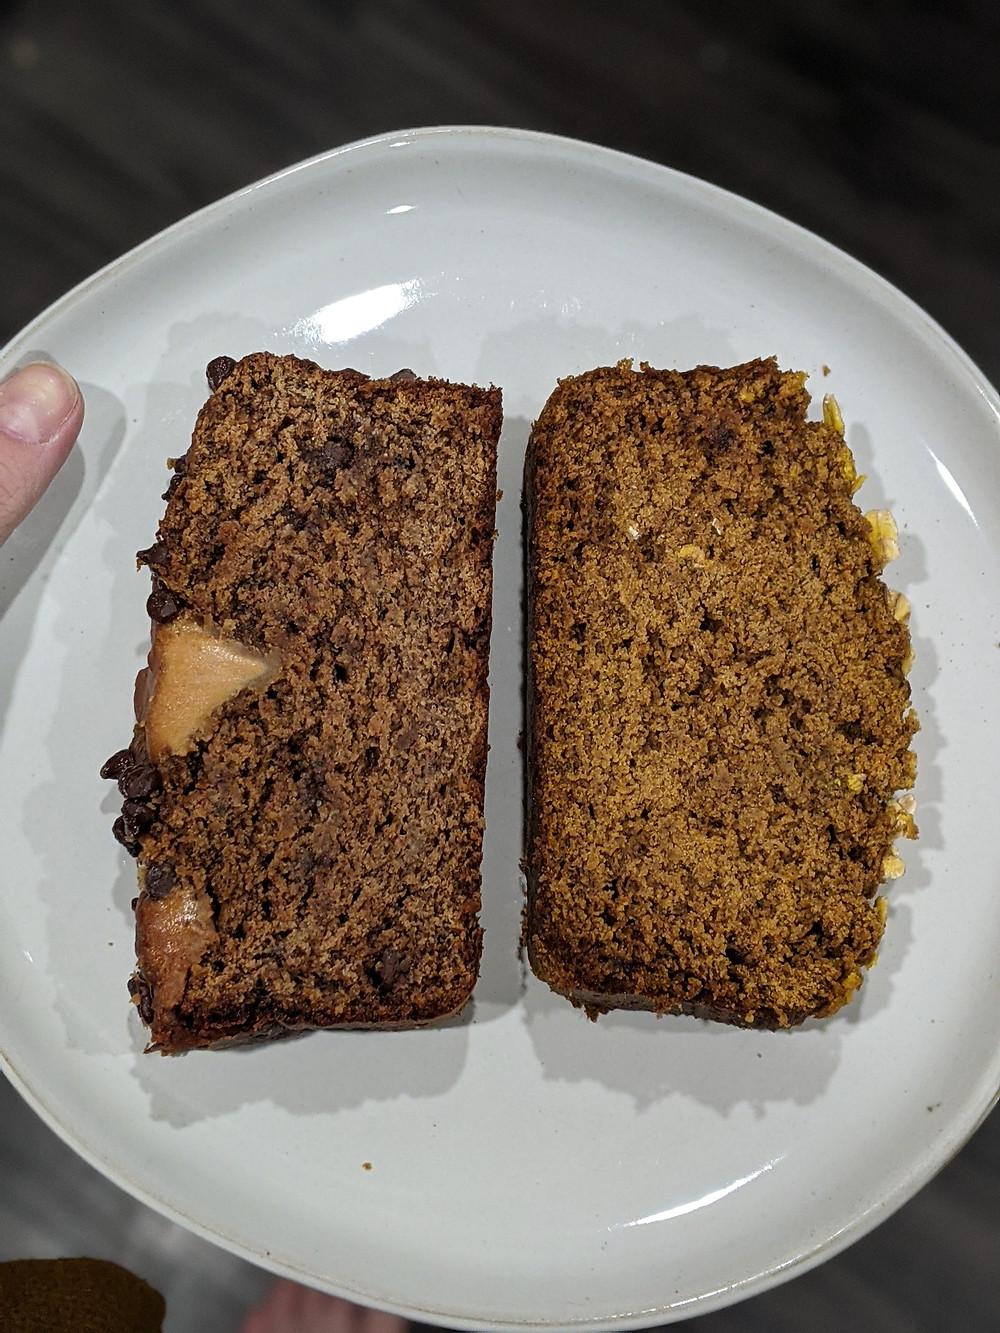 Allergy-Friendly Pumpkin Bread (Nutmeg-Free) - amanda macgregor centineo - food allergy recipes